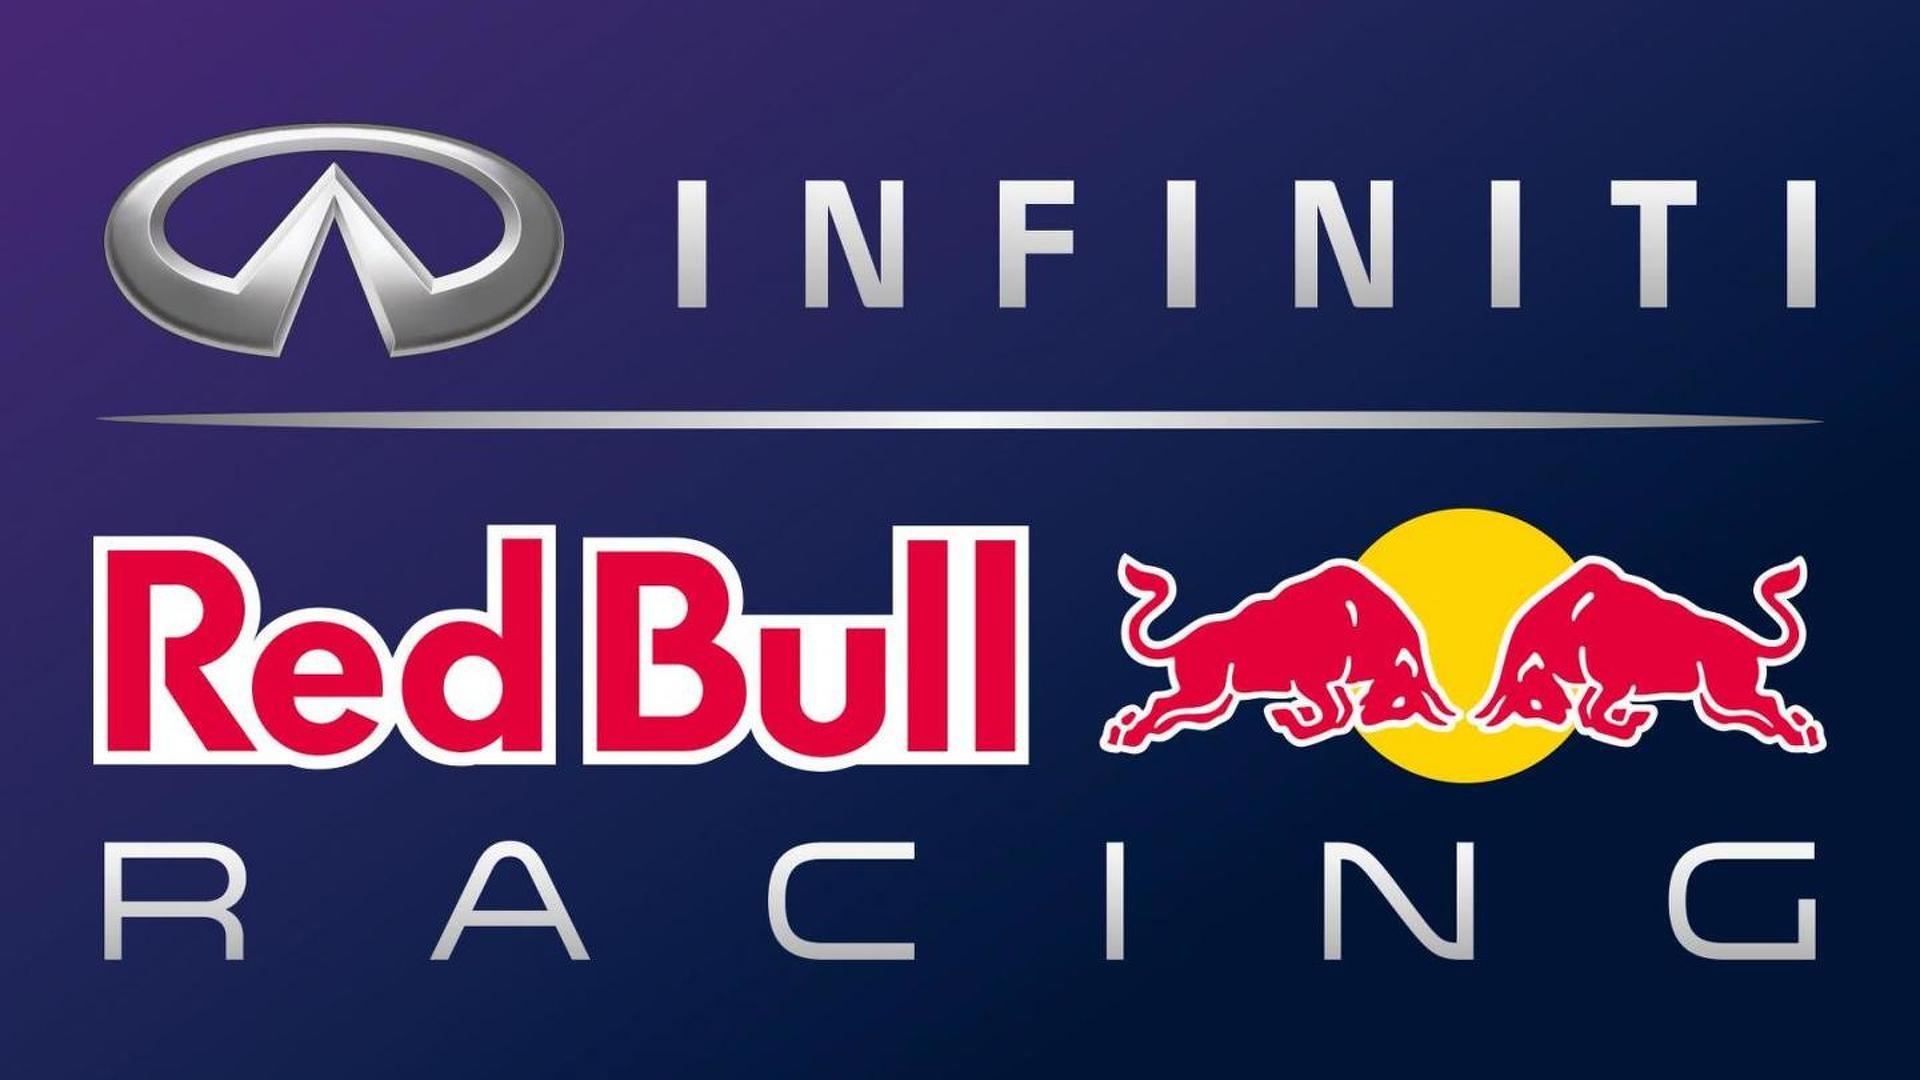 Red Bull to lose title sponsor Infiniti - report